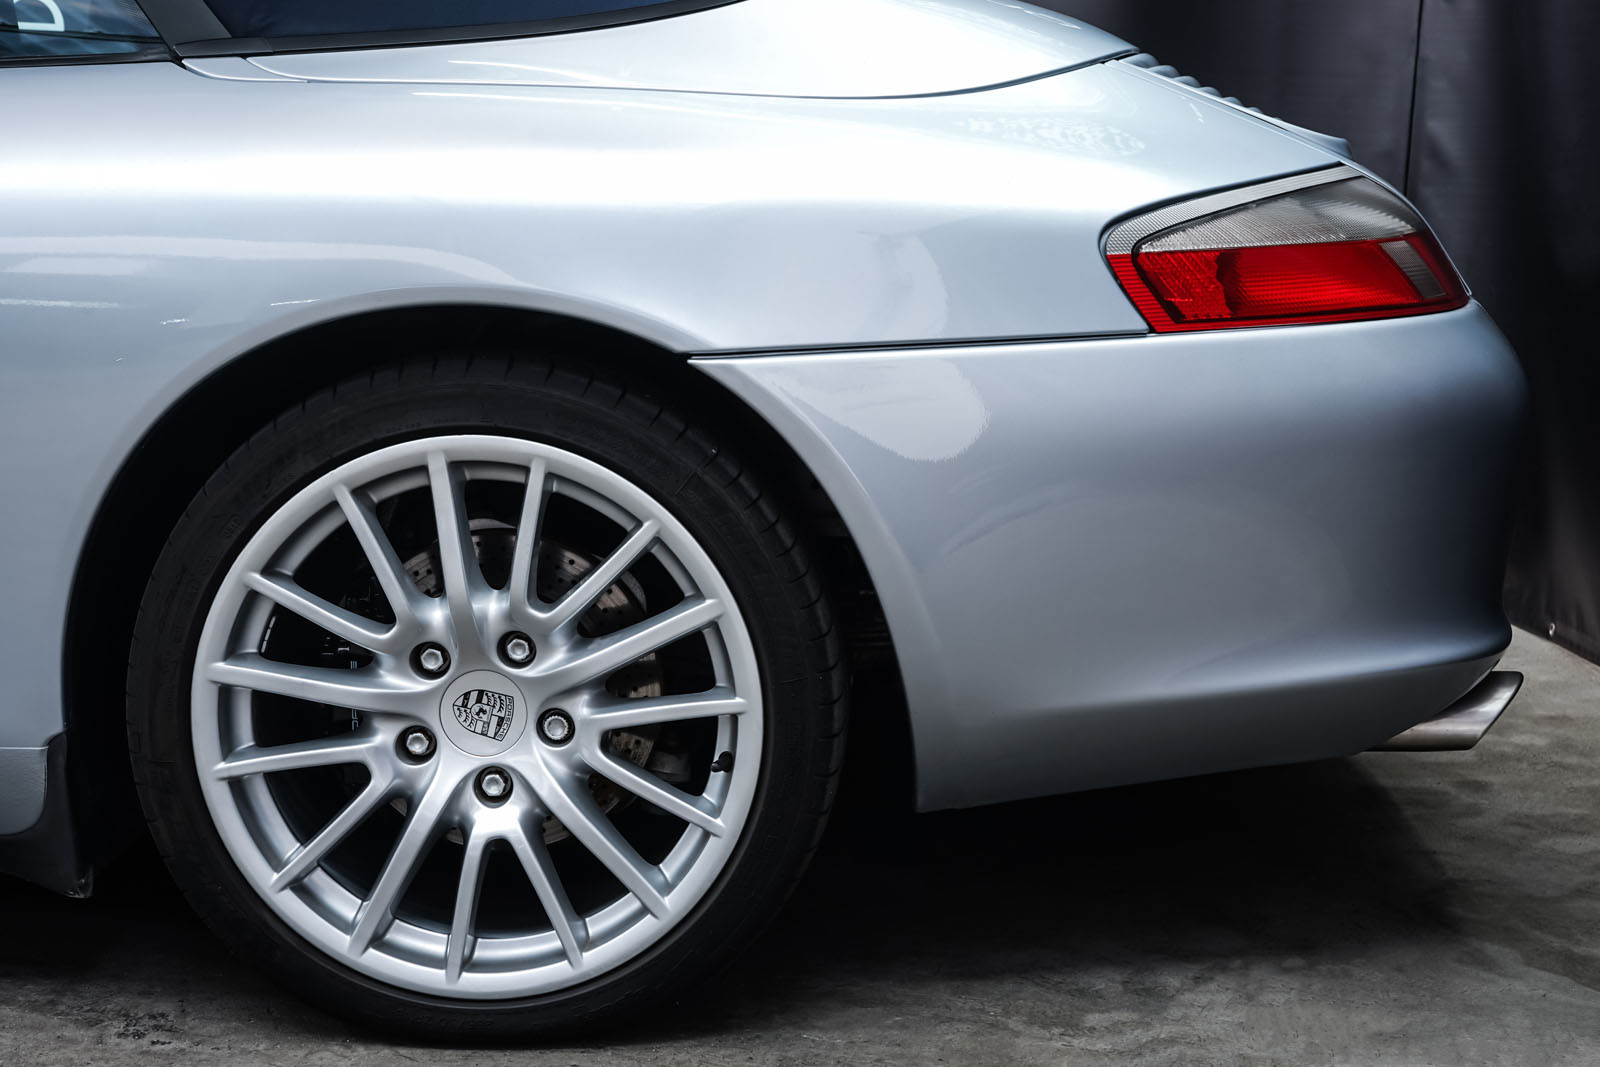 Porsche_996_Cabrio_Silber_Dunkelblau_POR-1724_4_w